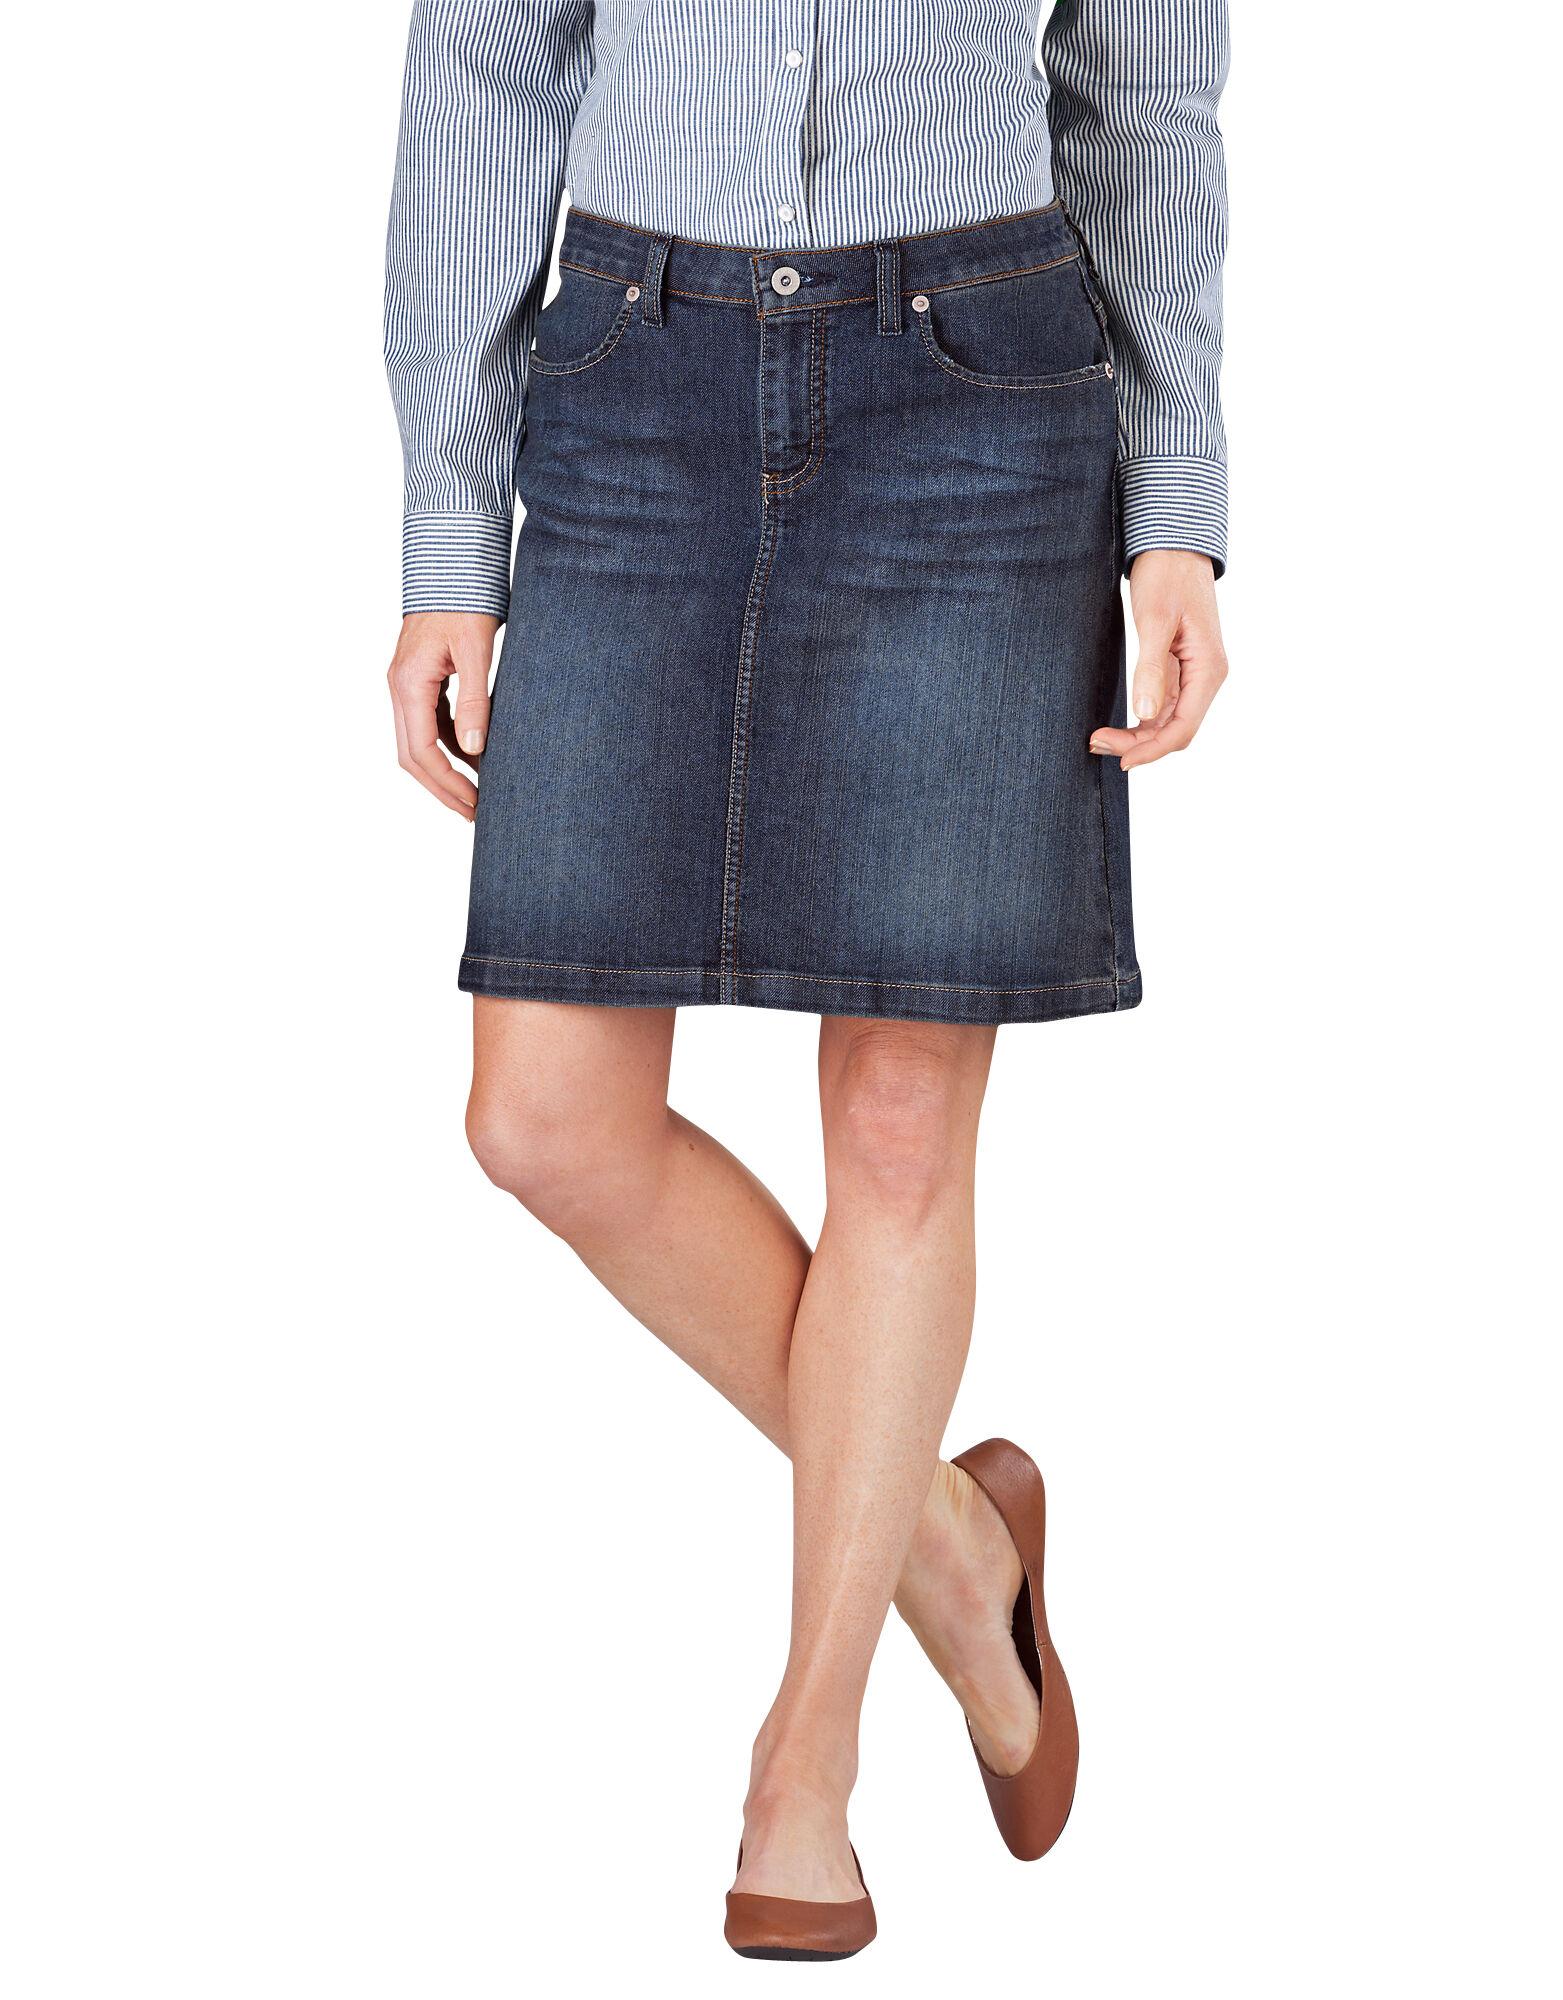 s denim skirts s shorts dickies